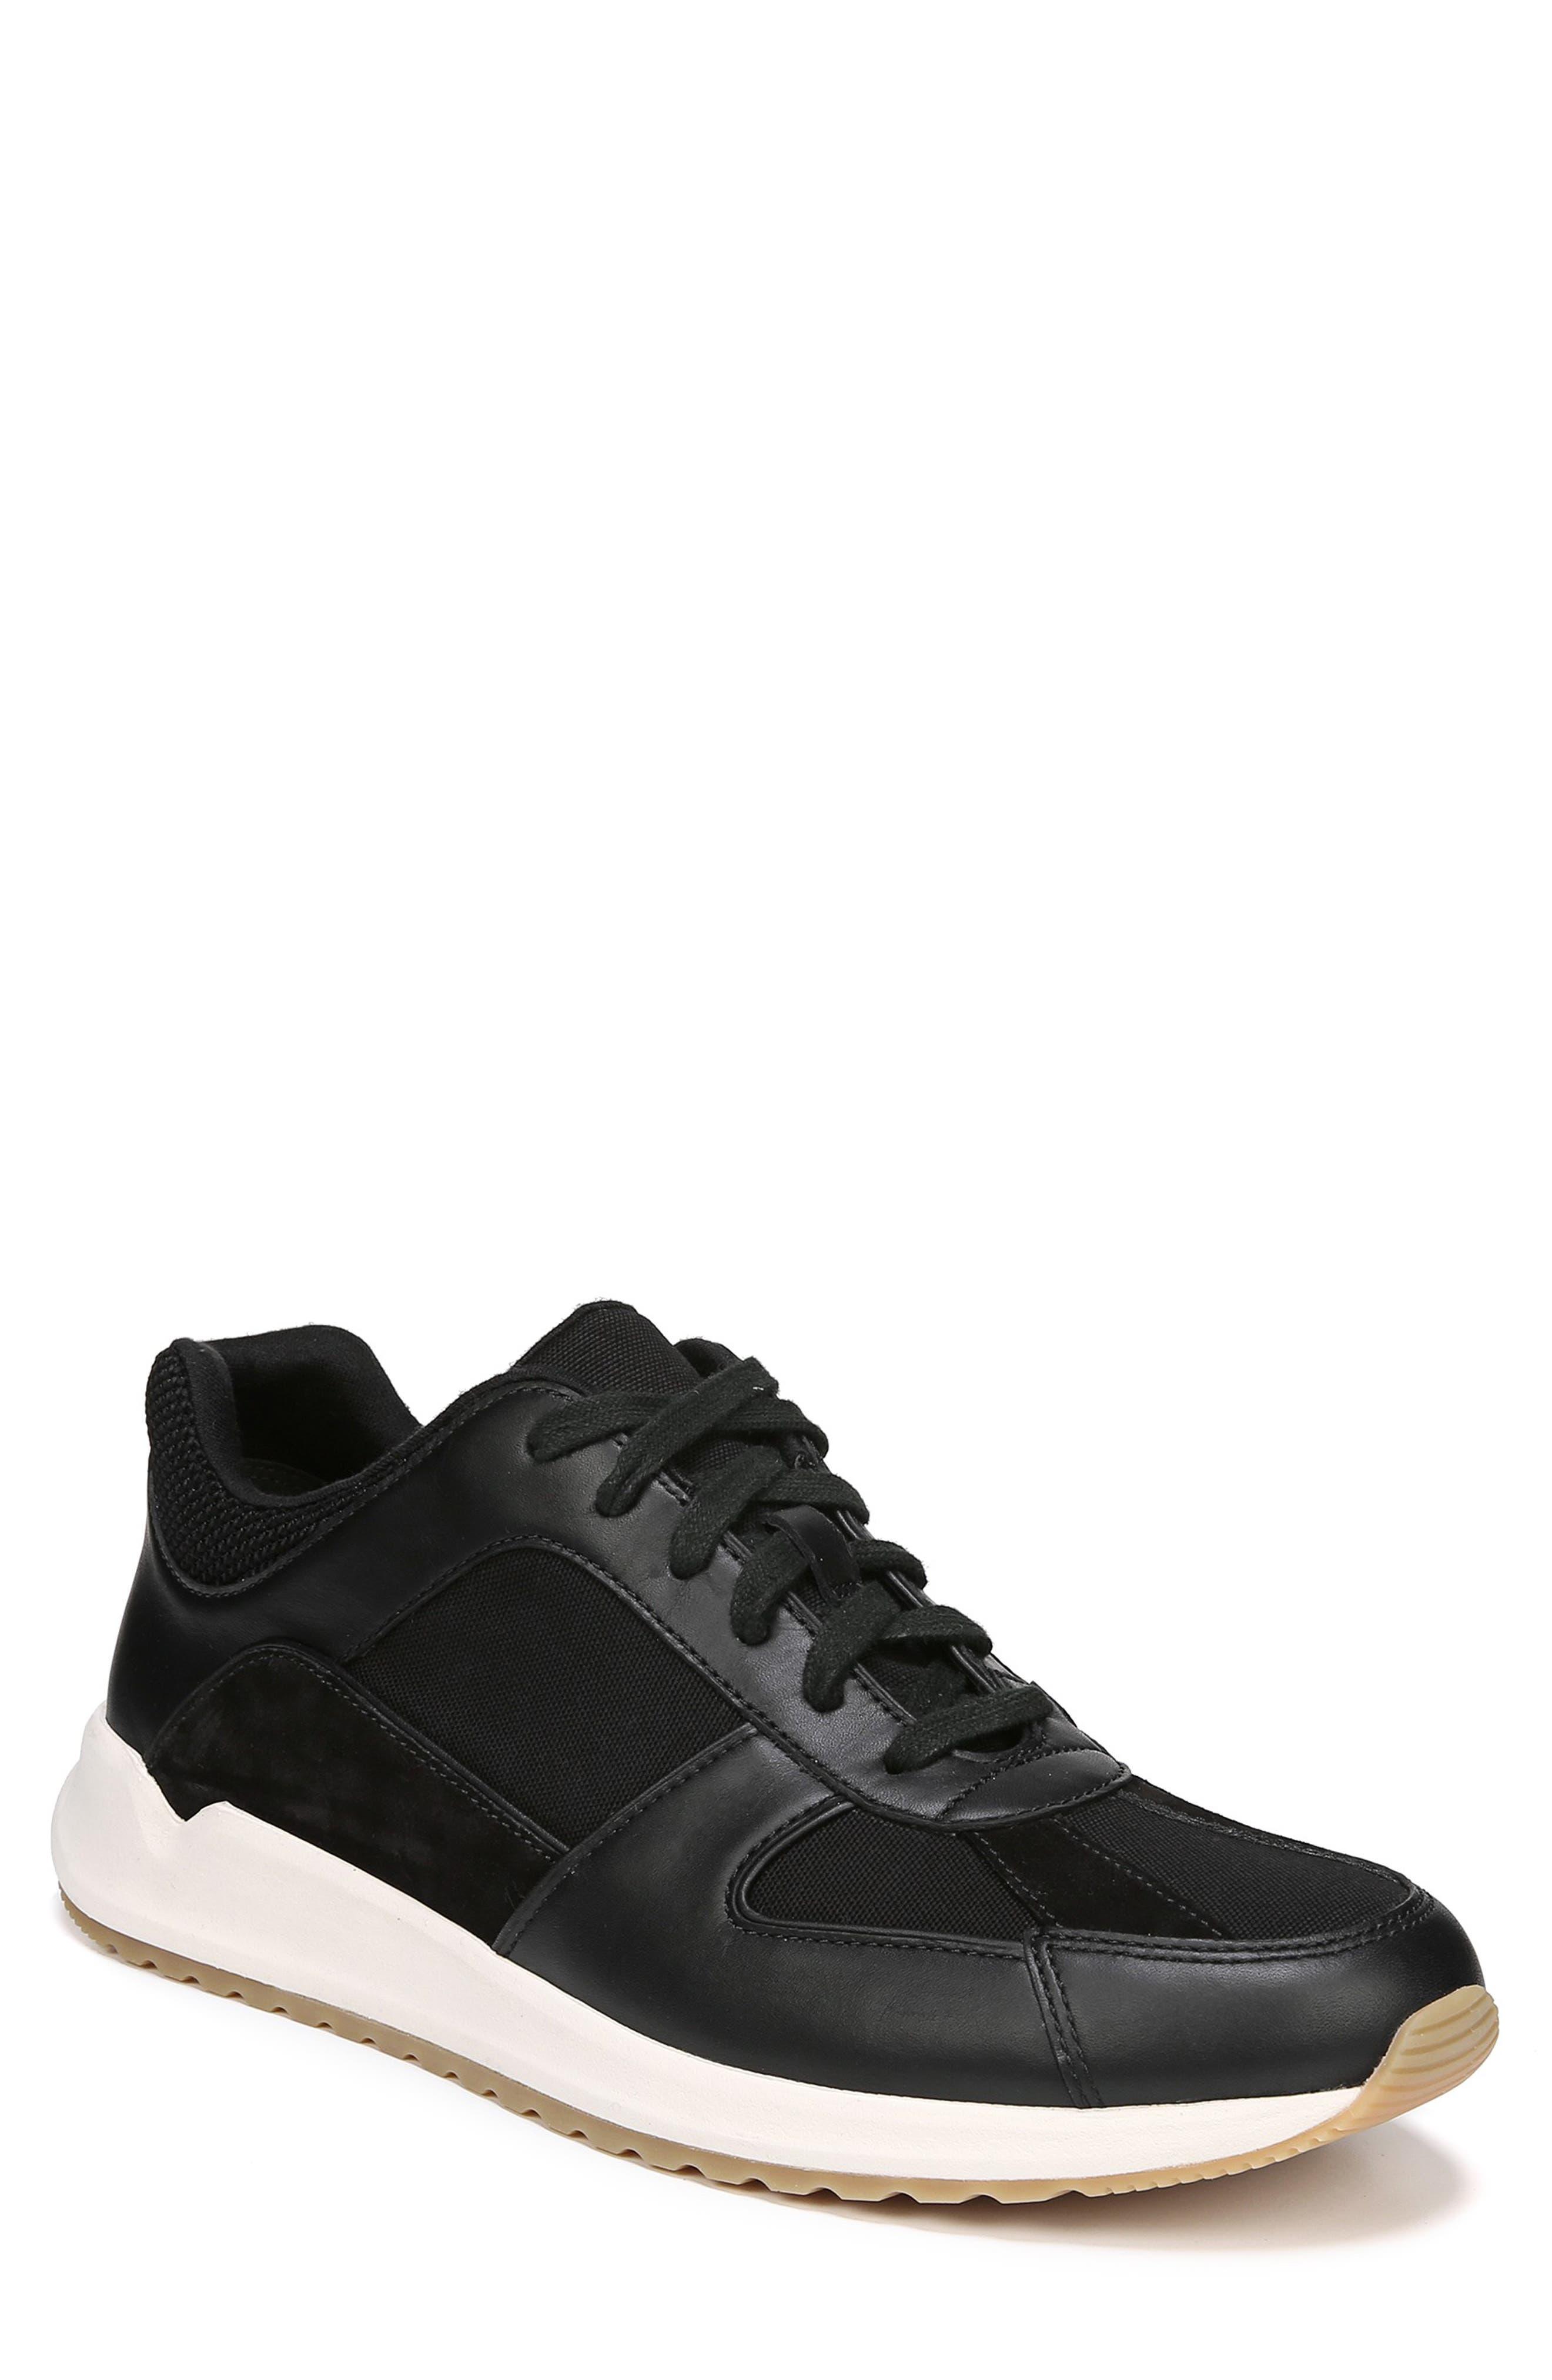 Griffin Sneaker,                         Main,                         color, BLACK/ MADDOX